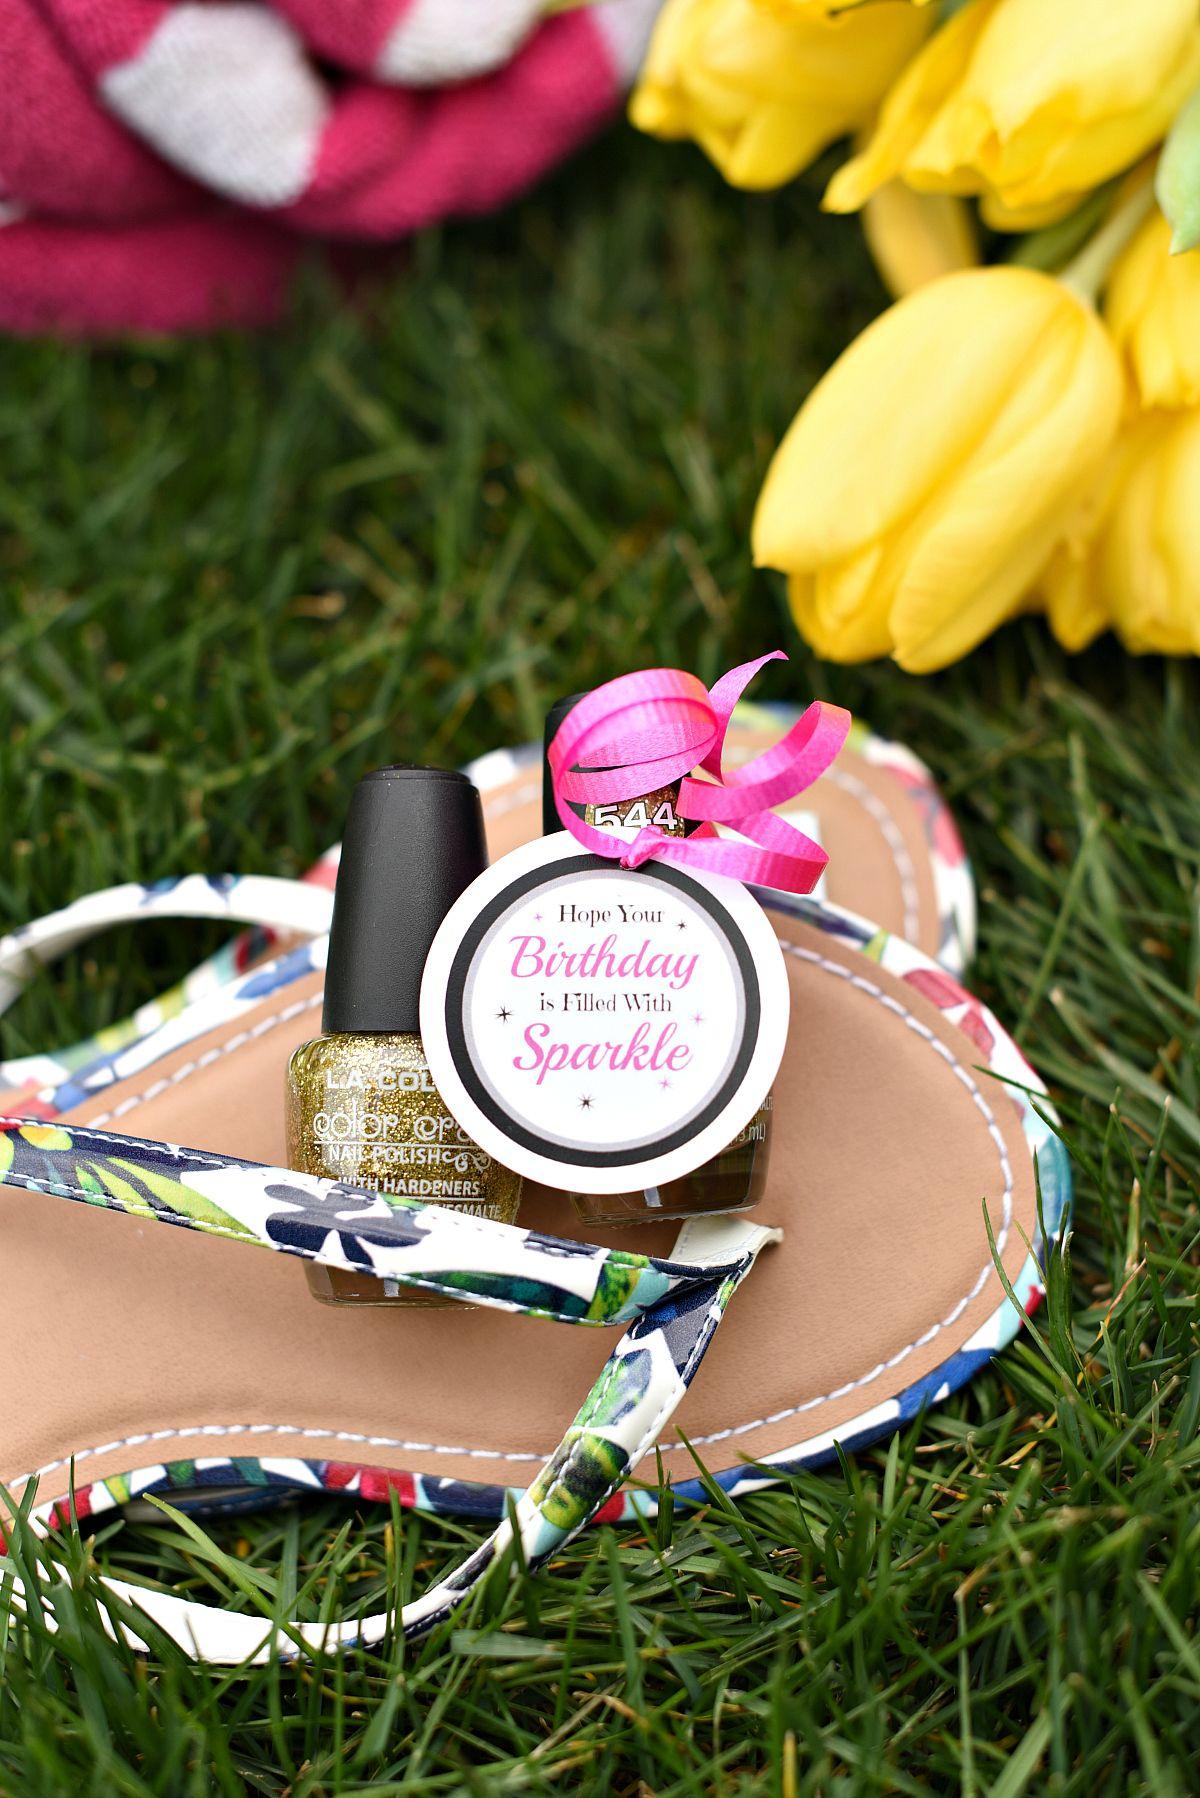 Cute nail polish gift diy gifts for friends diy gift